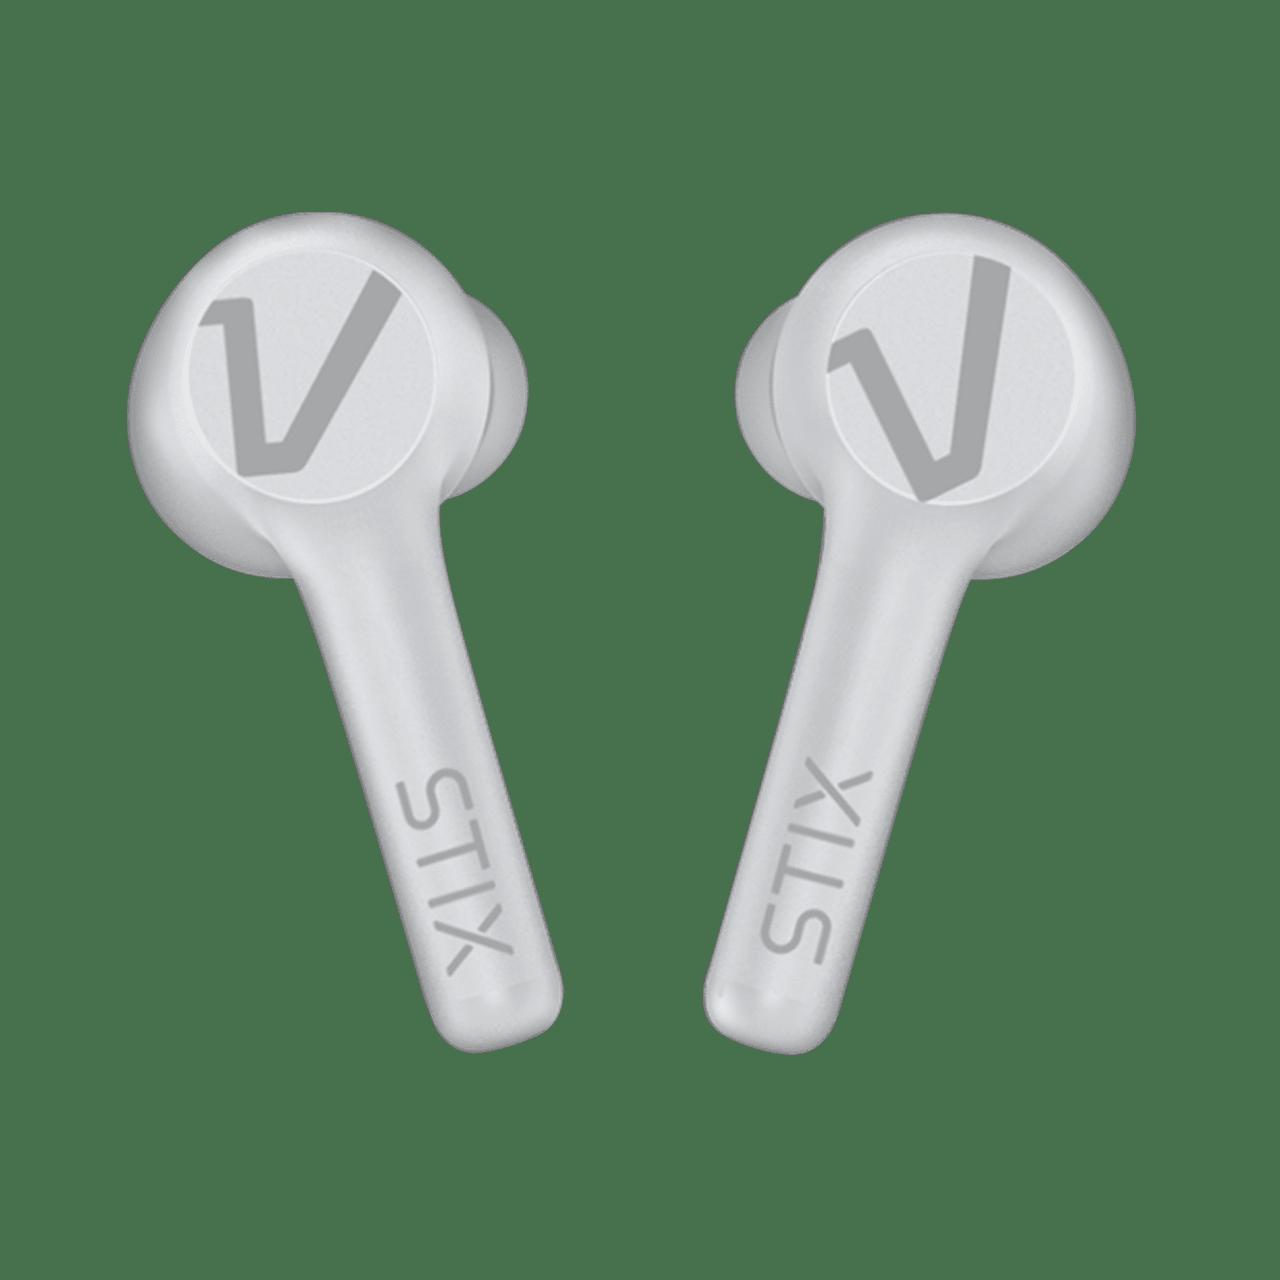 Veho STIX Ice White True Wireless Bluetooth Earphones - 1